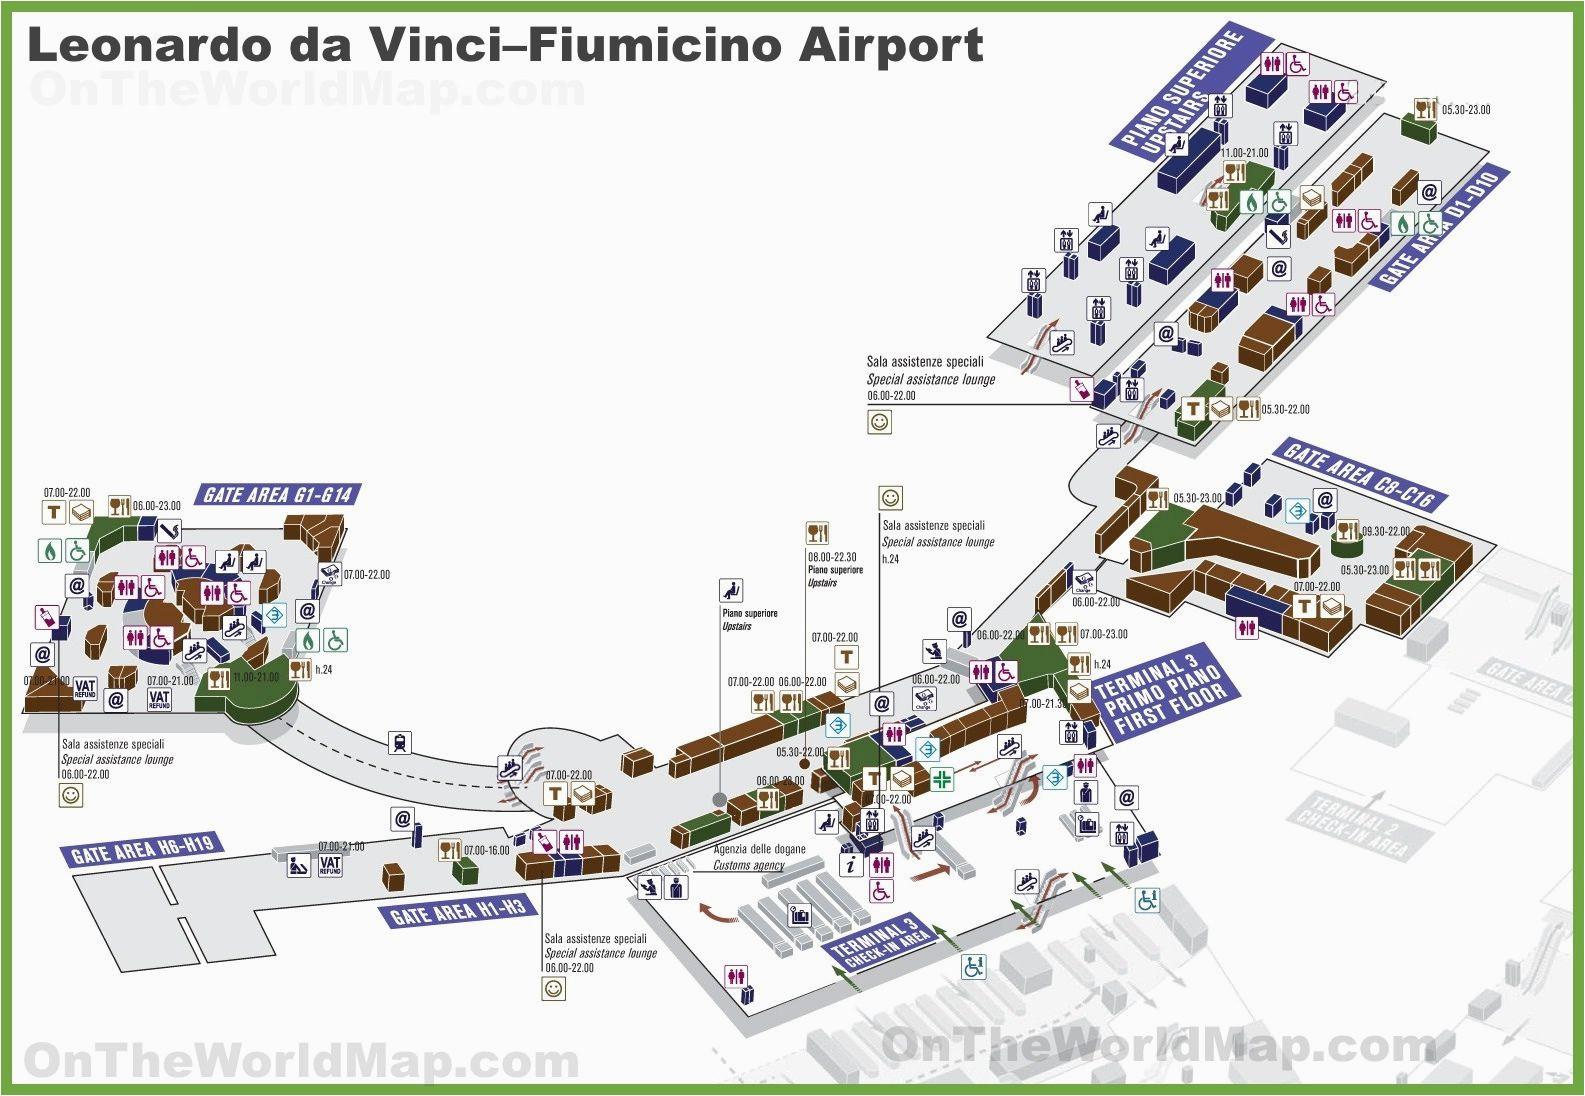 Airports In Rome Italy Map Pin by Jeannette Beaver On Pilot In 2019 Leonardo Da Vinci Rome